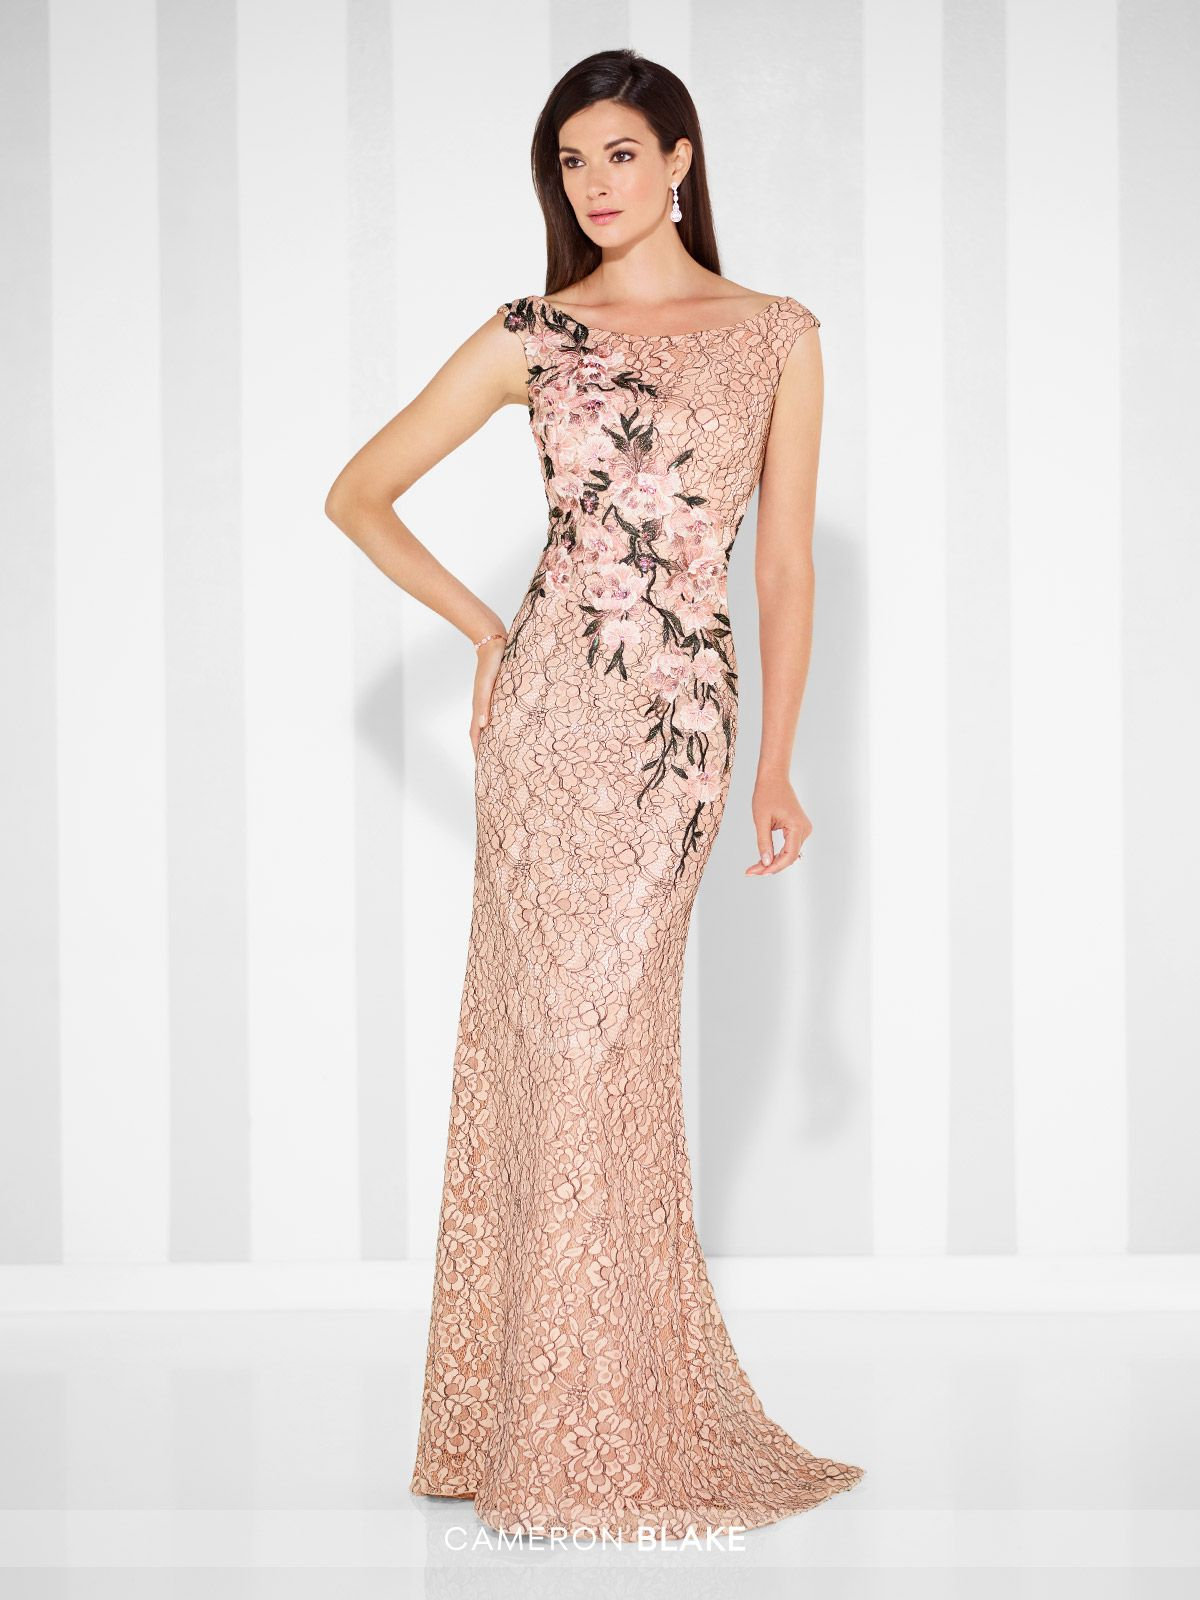 Cameron Blake - Evening Dresses - 117607 | moda | Pinterest ...